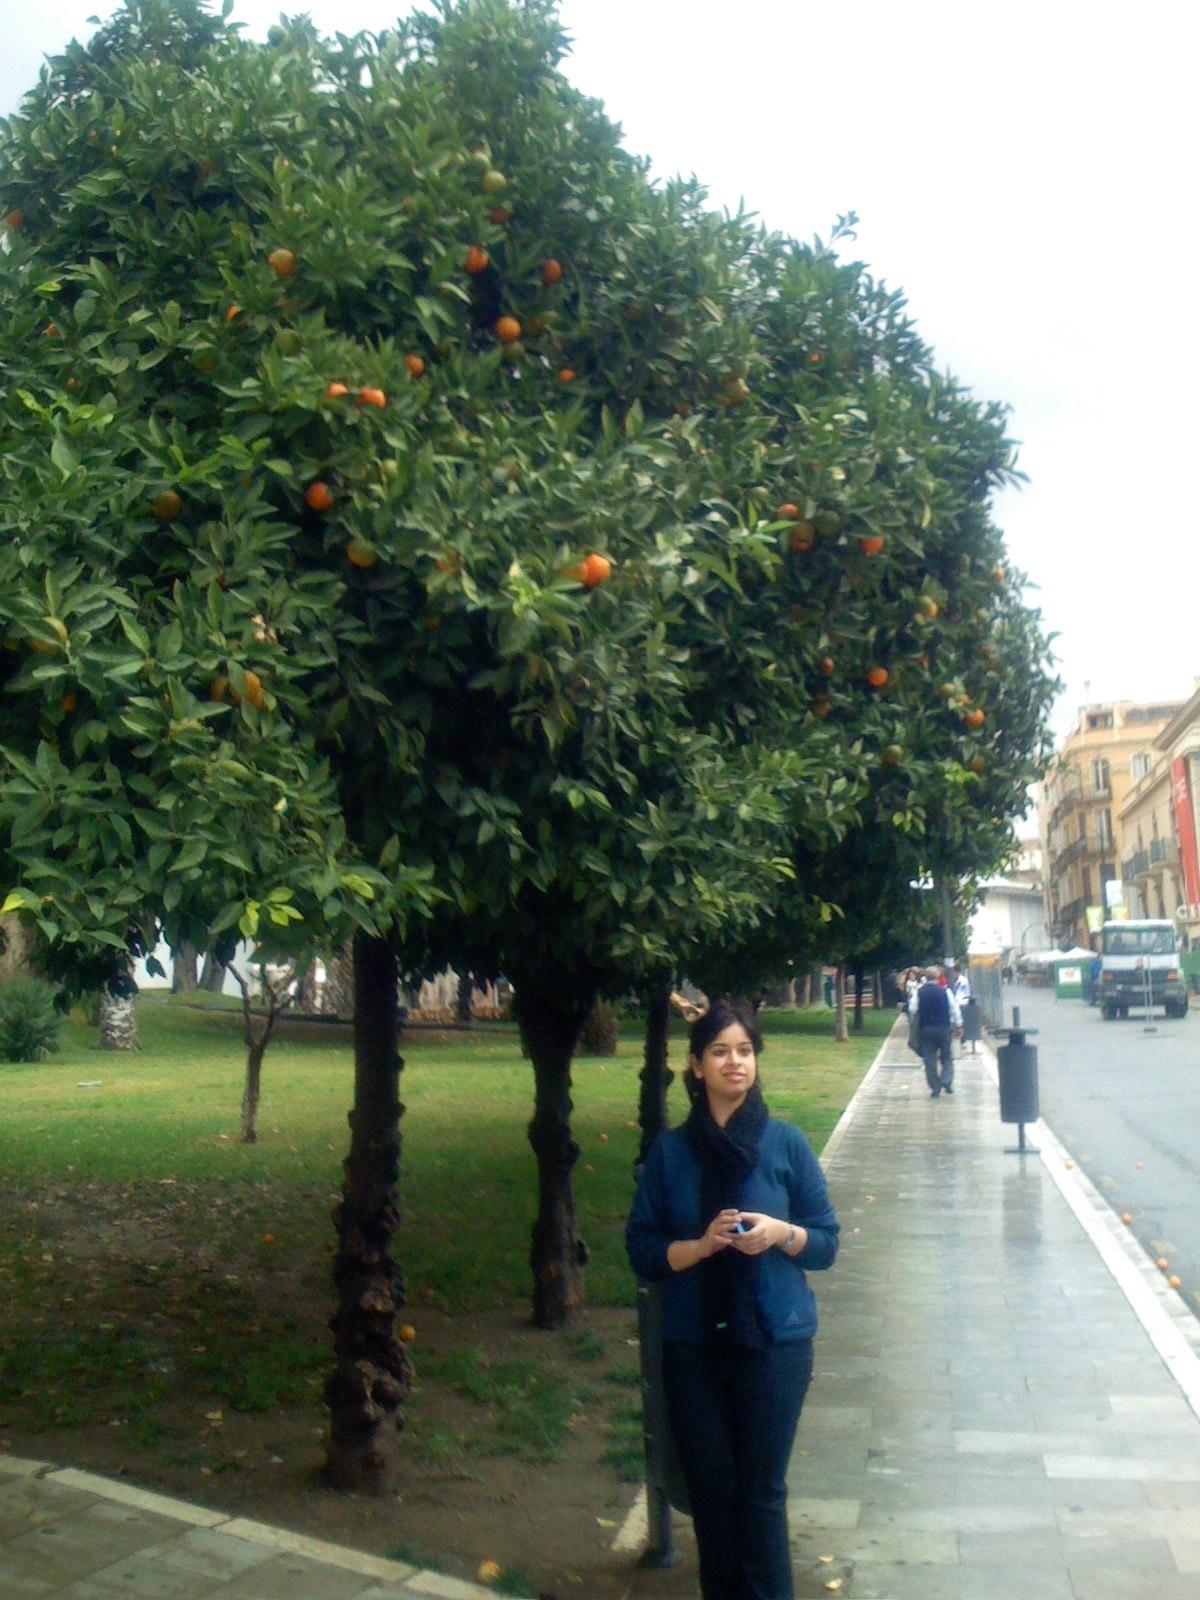 Strrets Of Malaga Spain